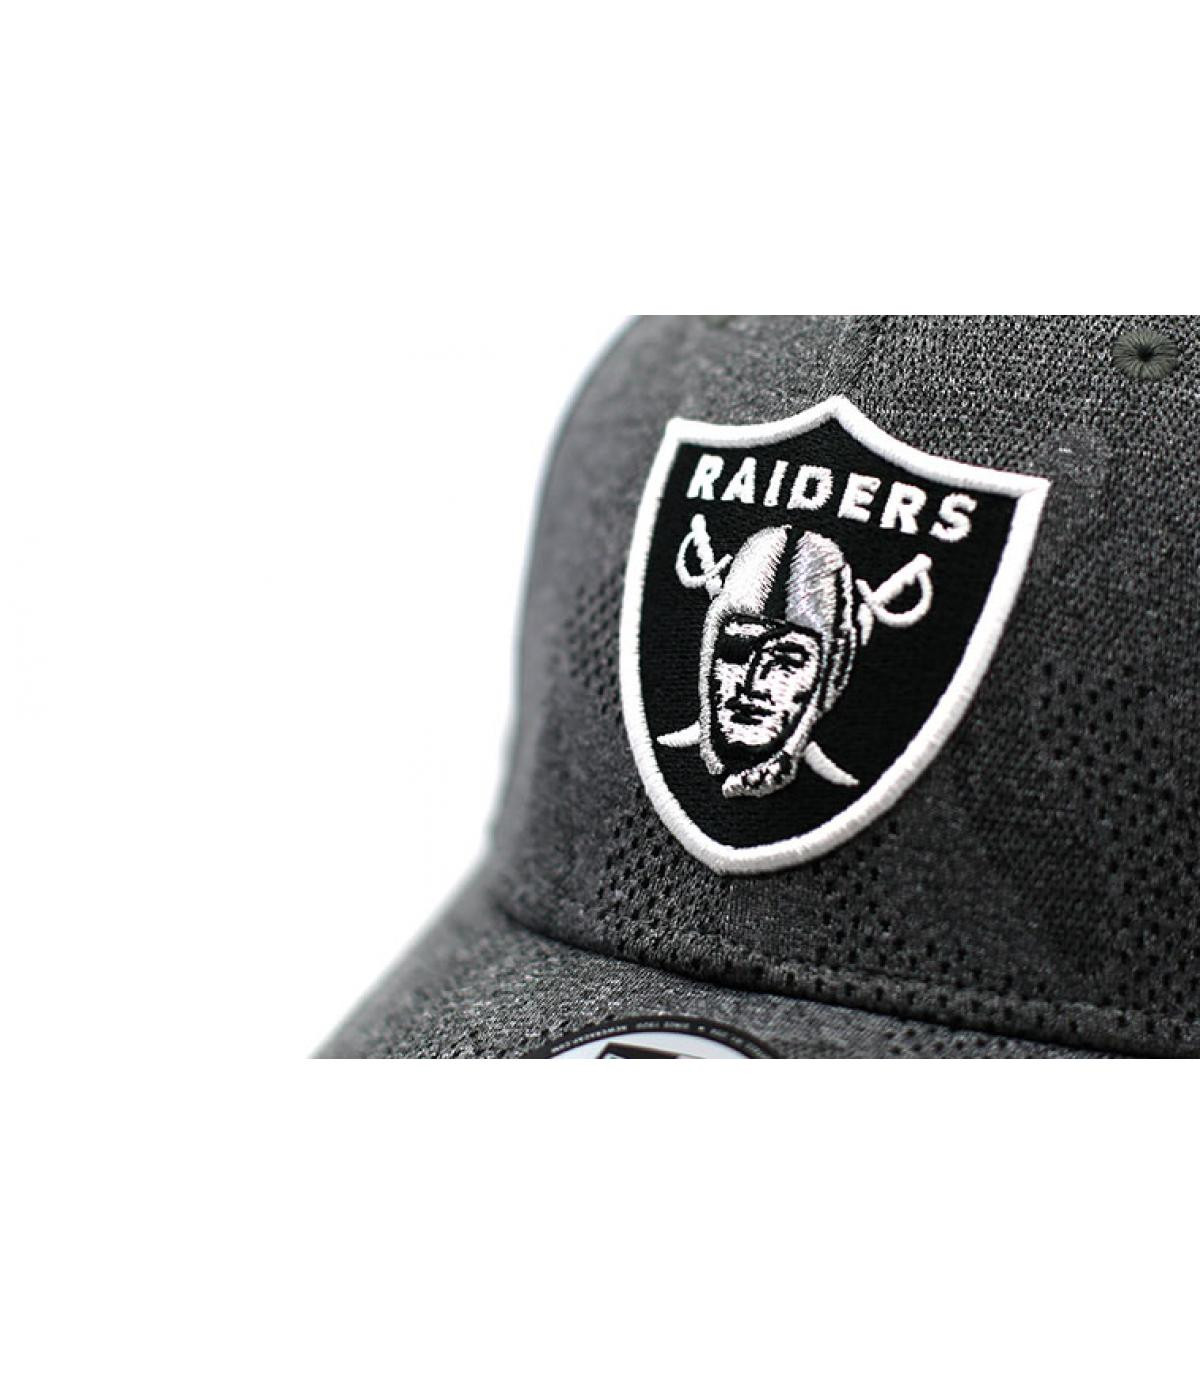 Detalles Engineered Plus Raiders 3930 black imagen 3